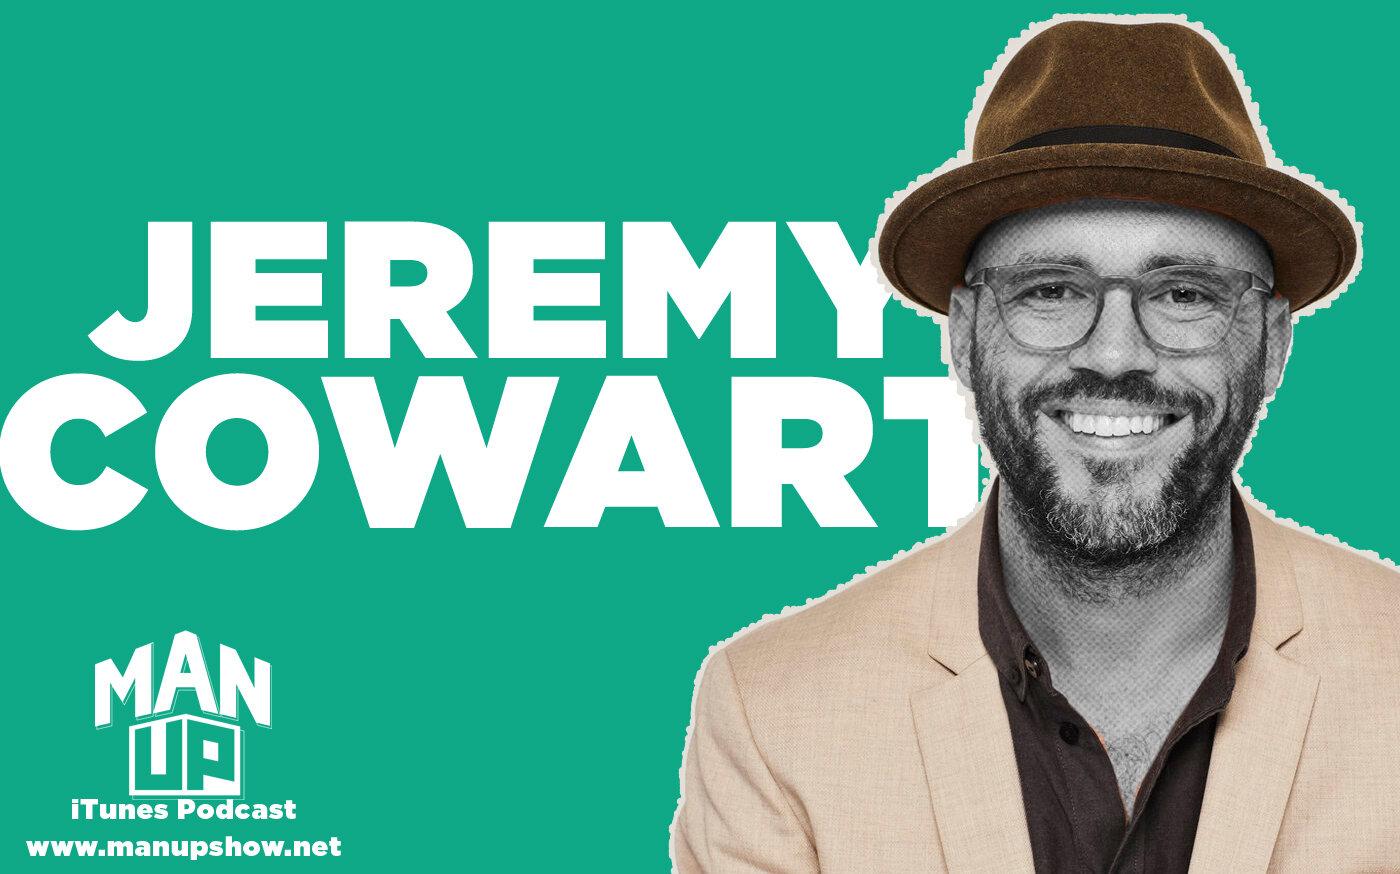 Man-Up-podcast-Episode-029-Jeremy-Cowart.jpg